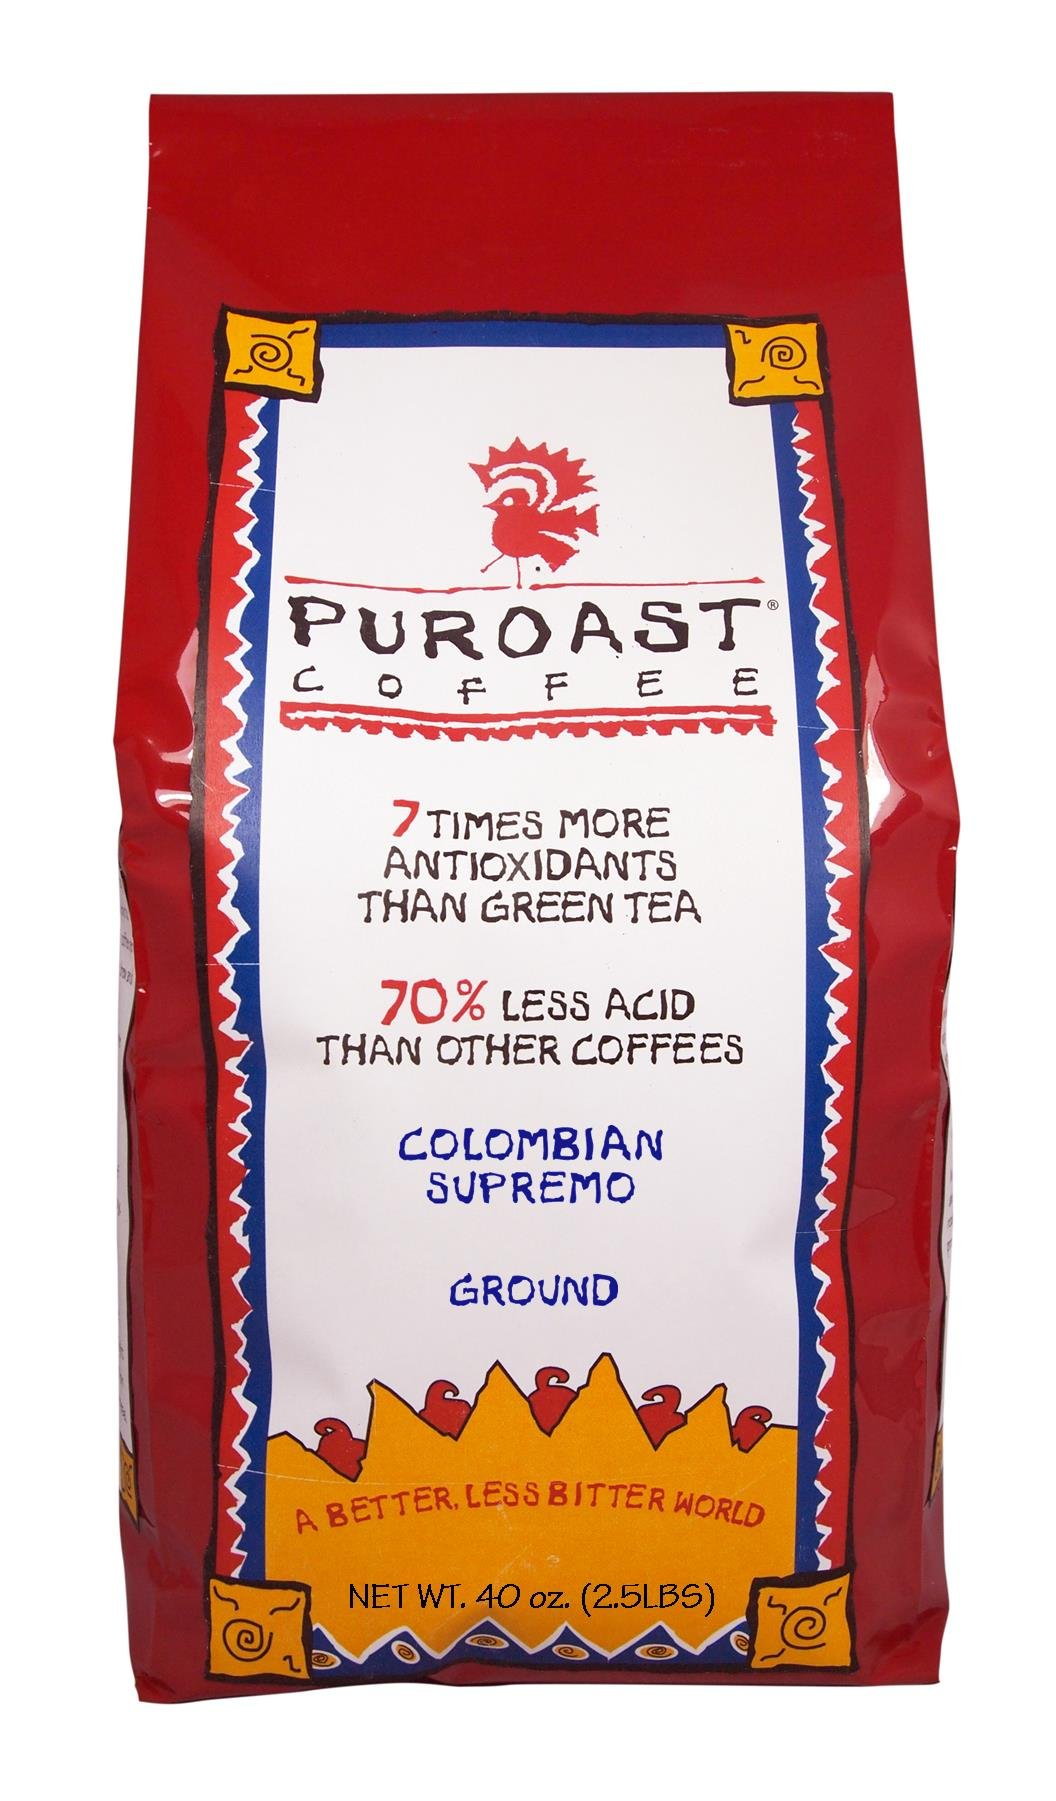 Puroast Low Acid Coffee Colombian Supremo Blend Drip Grind, 2.5-Pound Bag